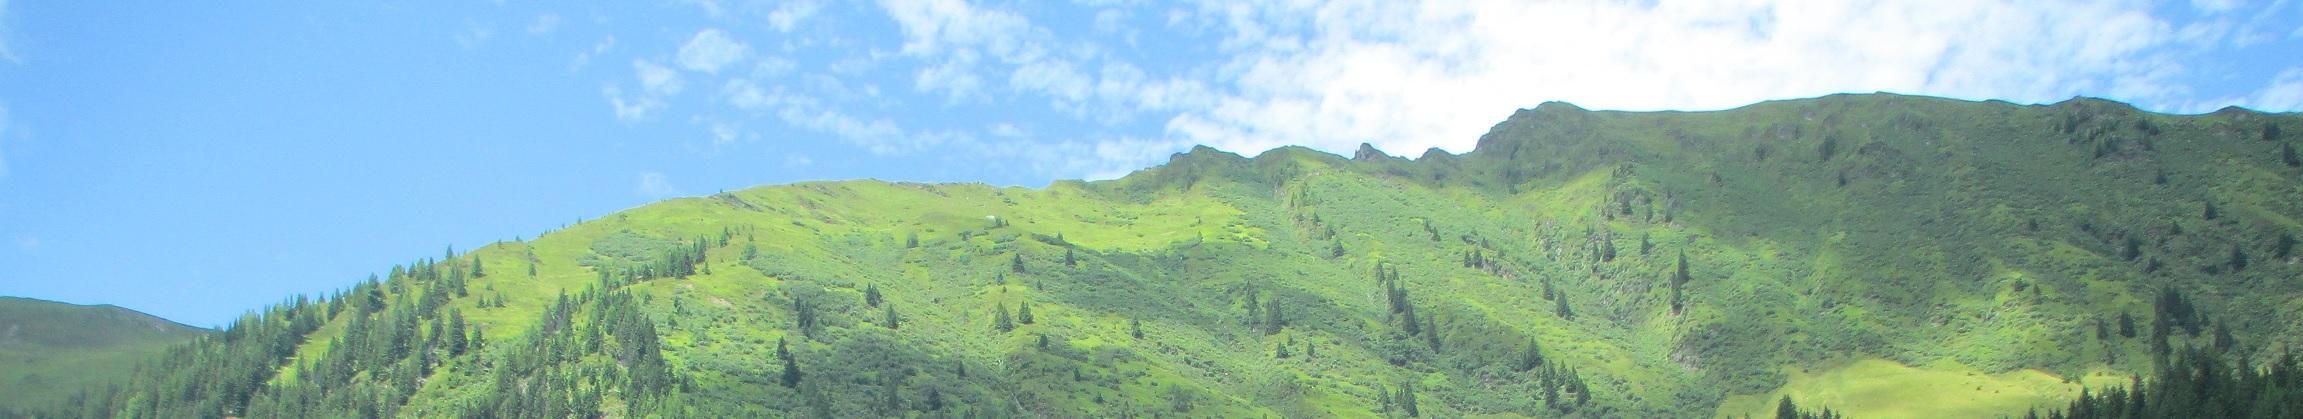 Berge der Diabär-Alm